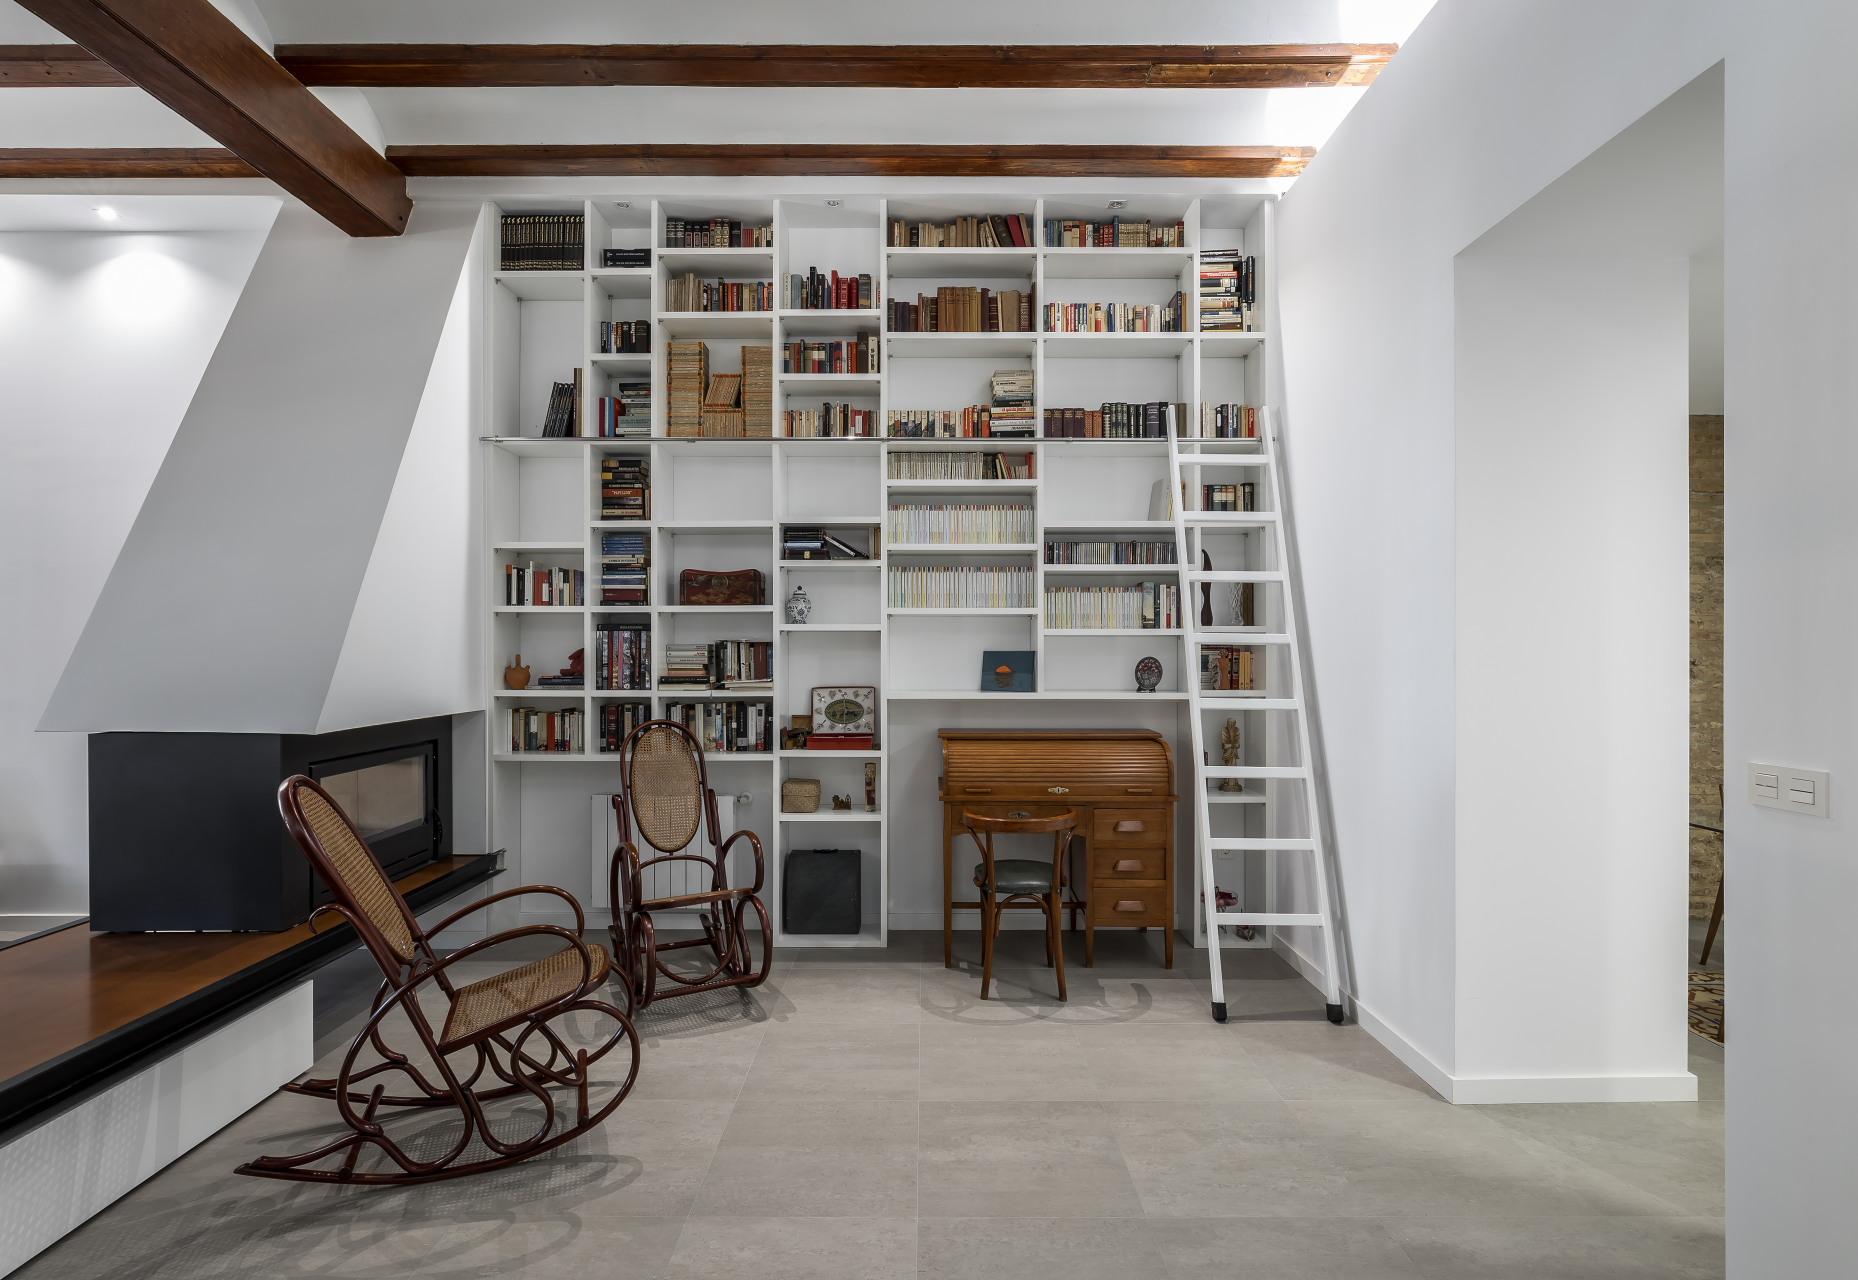 fotografia-arquitectura-valencia-german-cabo-viraje-rehabilitacion-campanar (33)